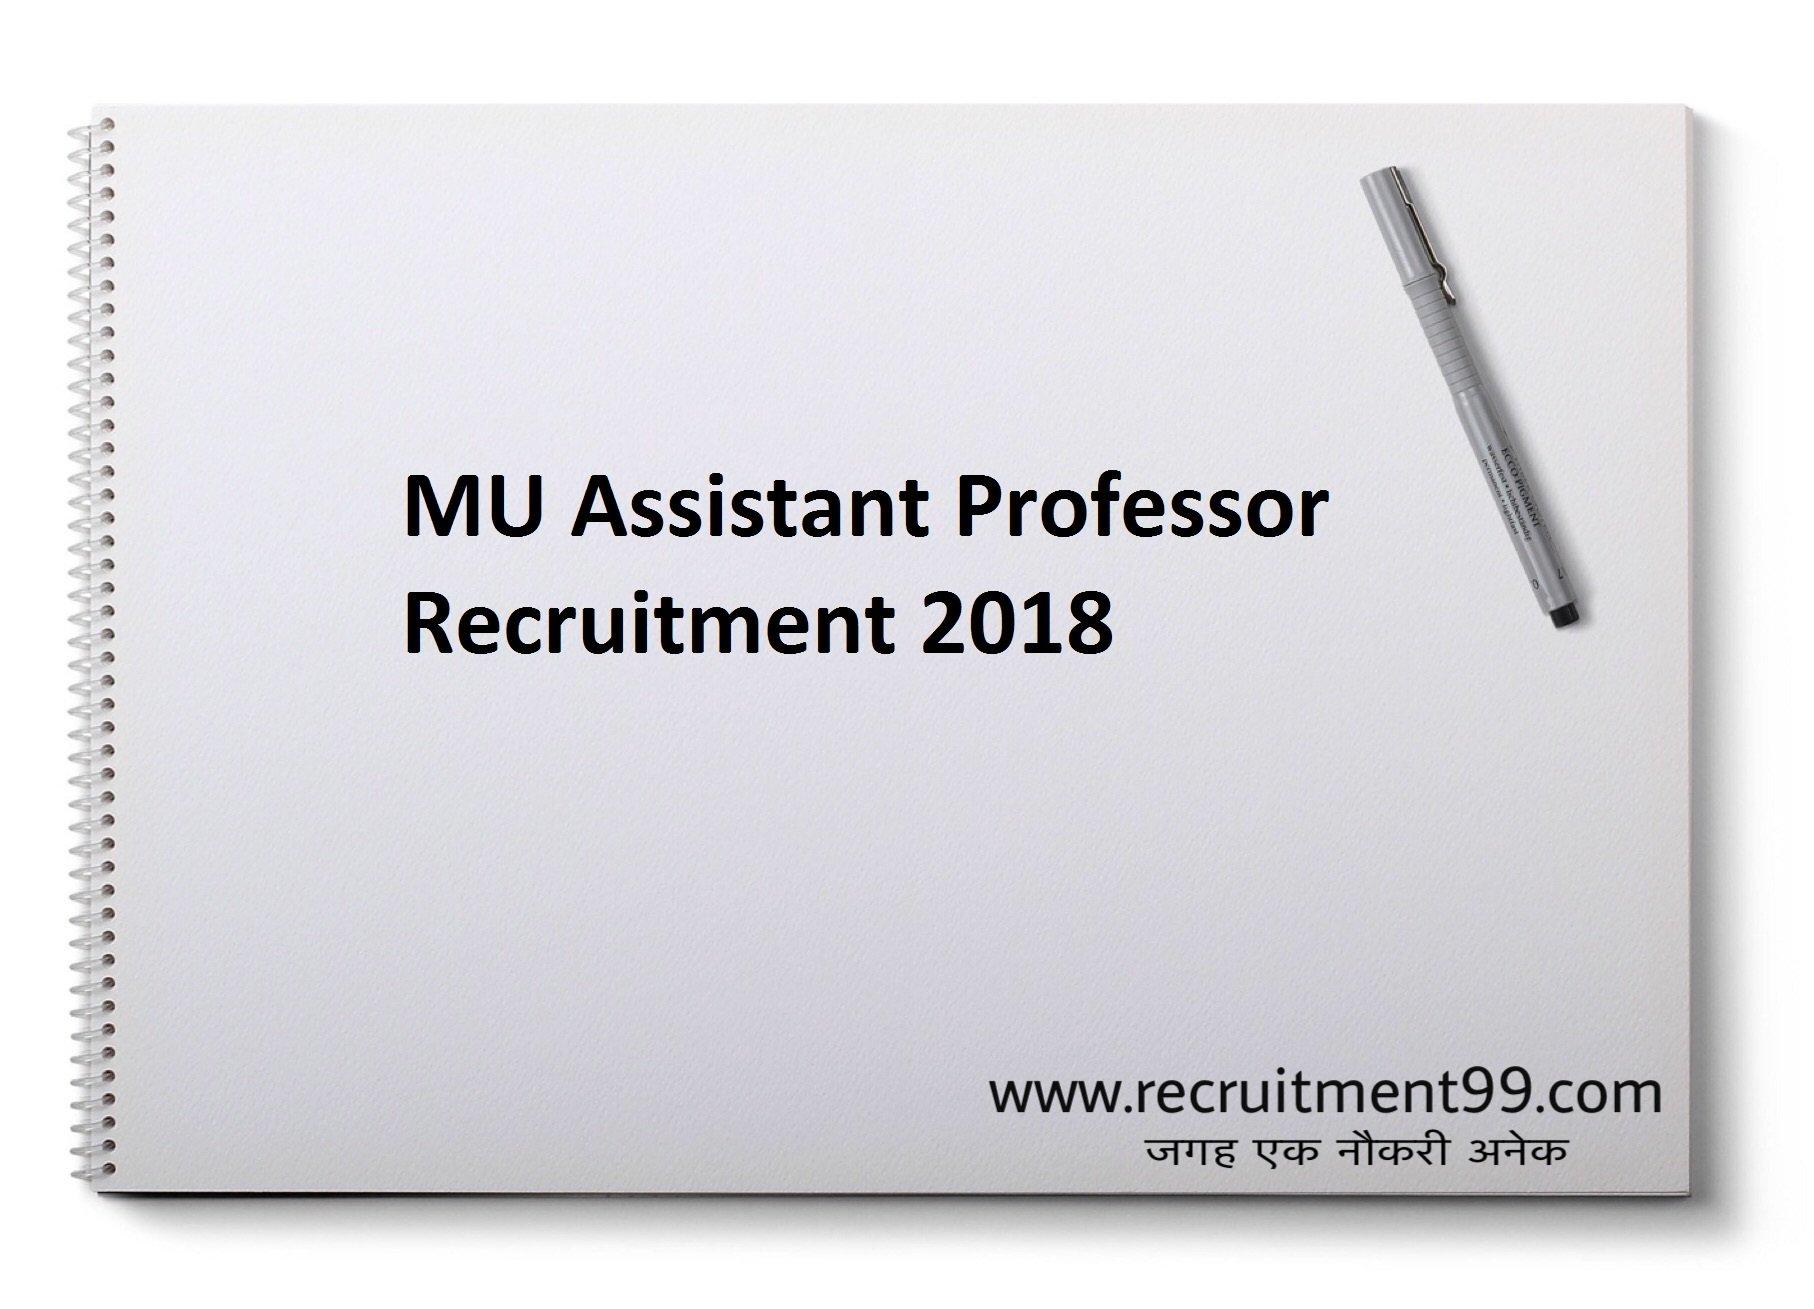 MU Assistant Professor Recruitment Admit Card Result 2018